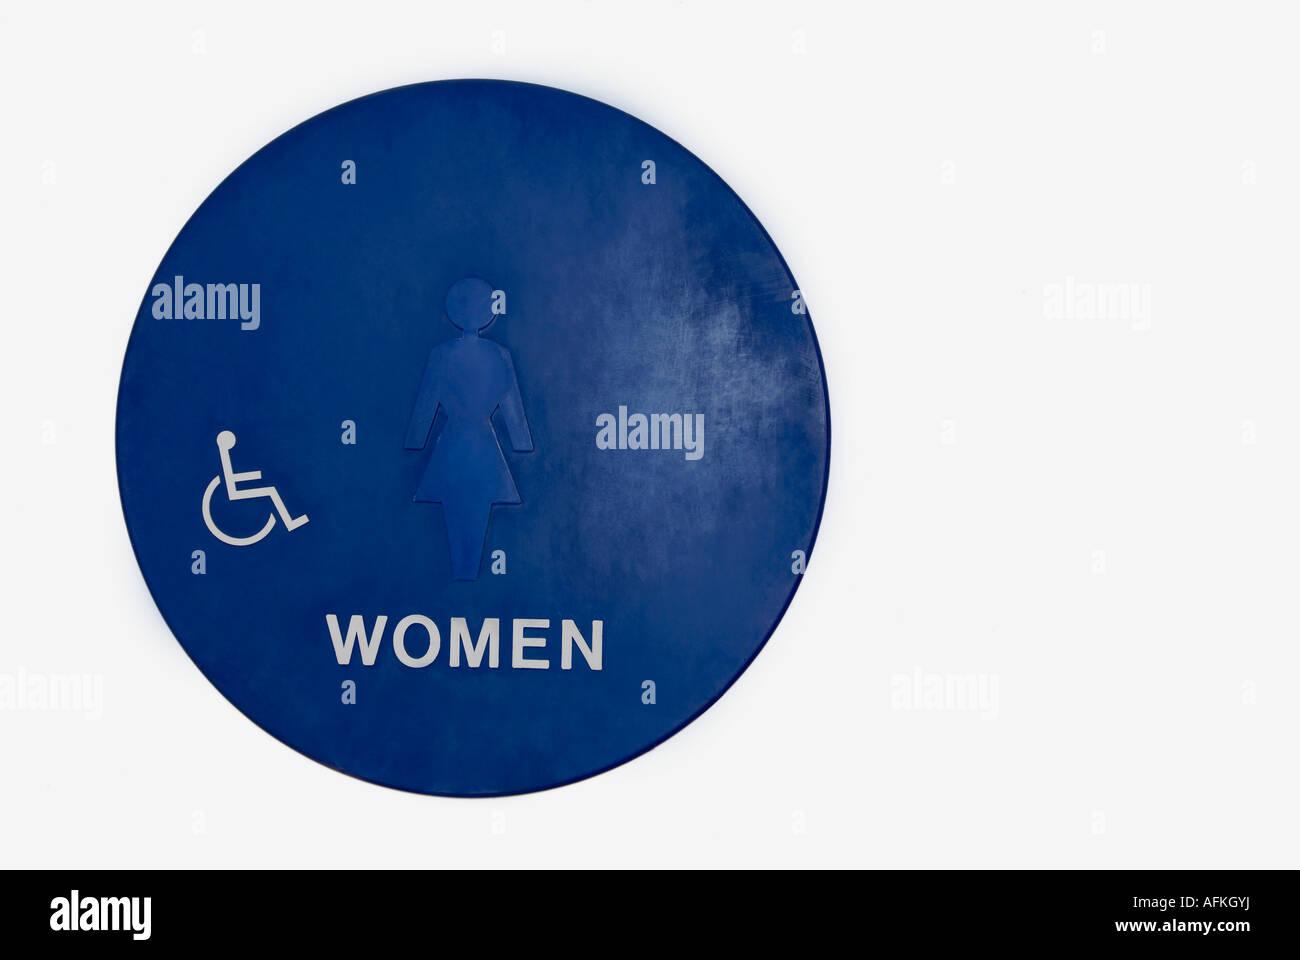 womens bathroom sign stock image - Womens Bathroom Sign